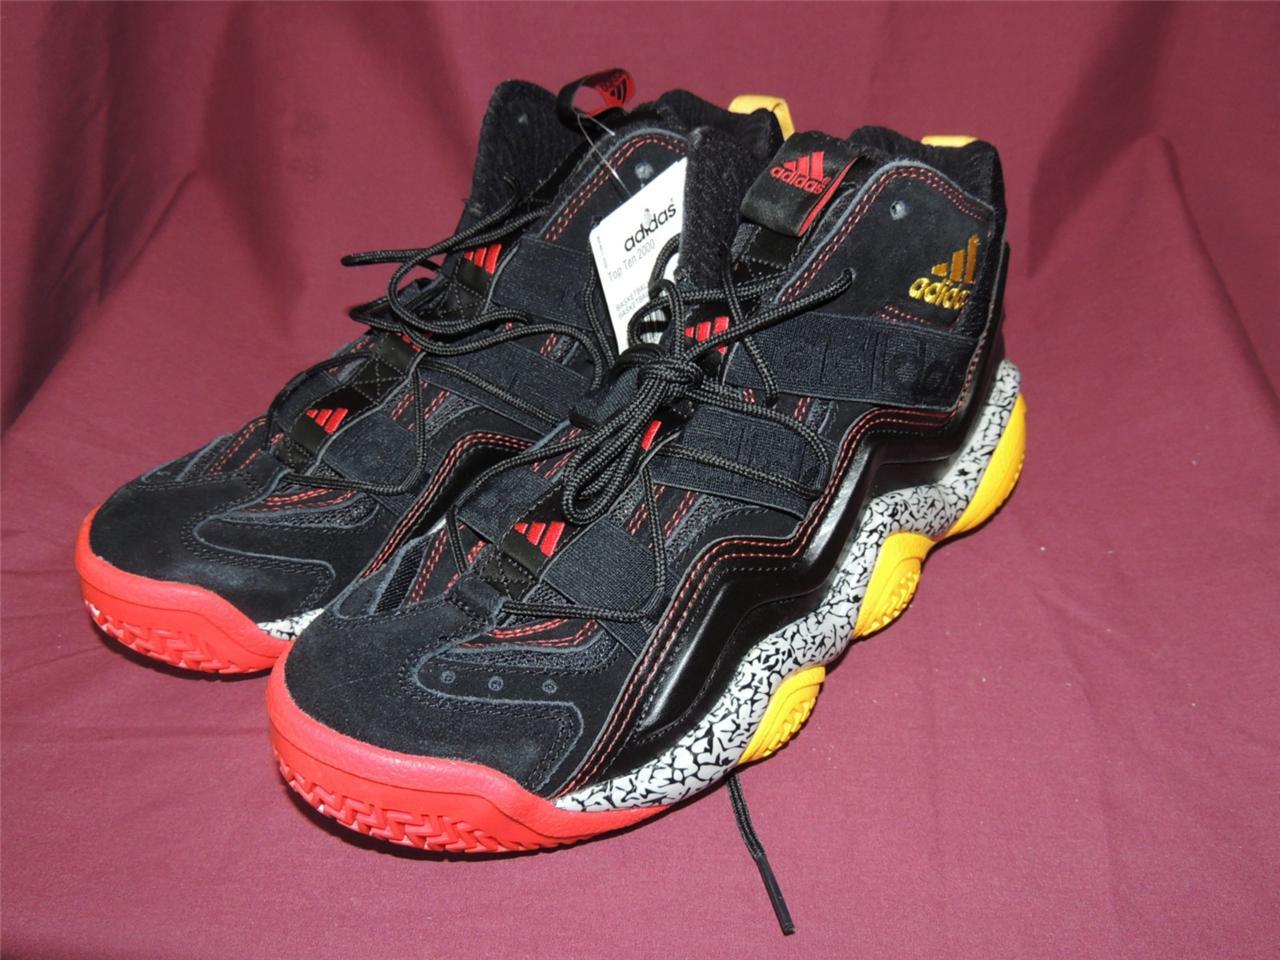 Назва adidas top ten 2000 g07947 basketball shoes black red